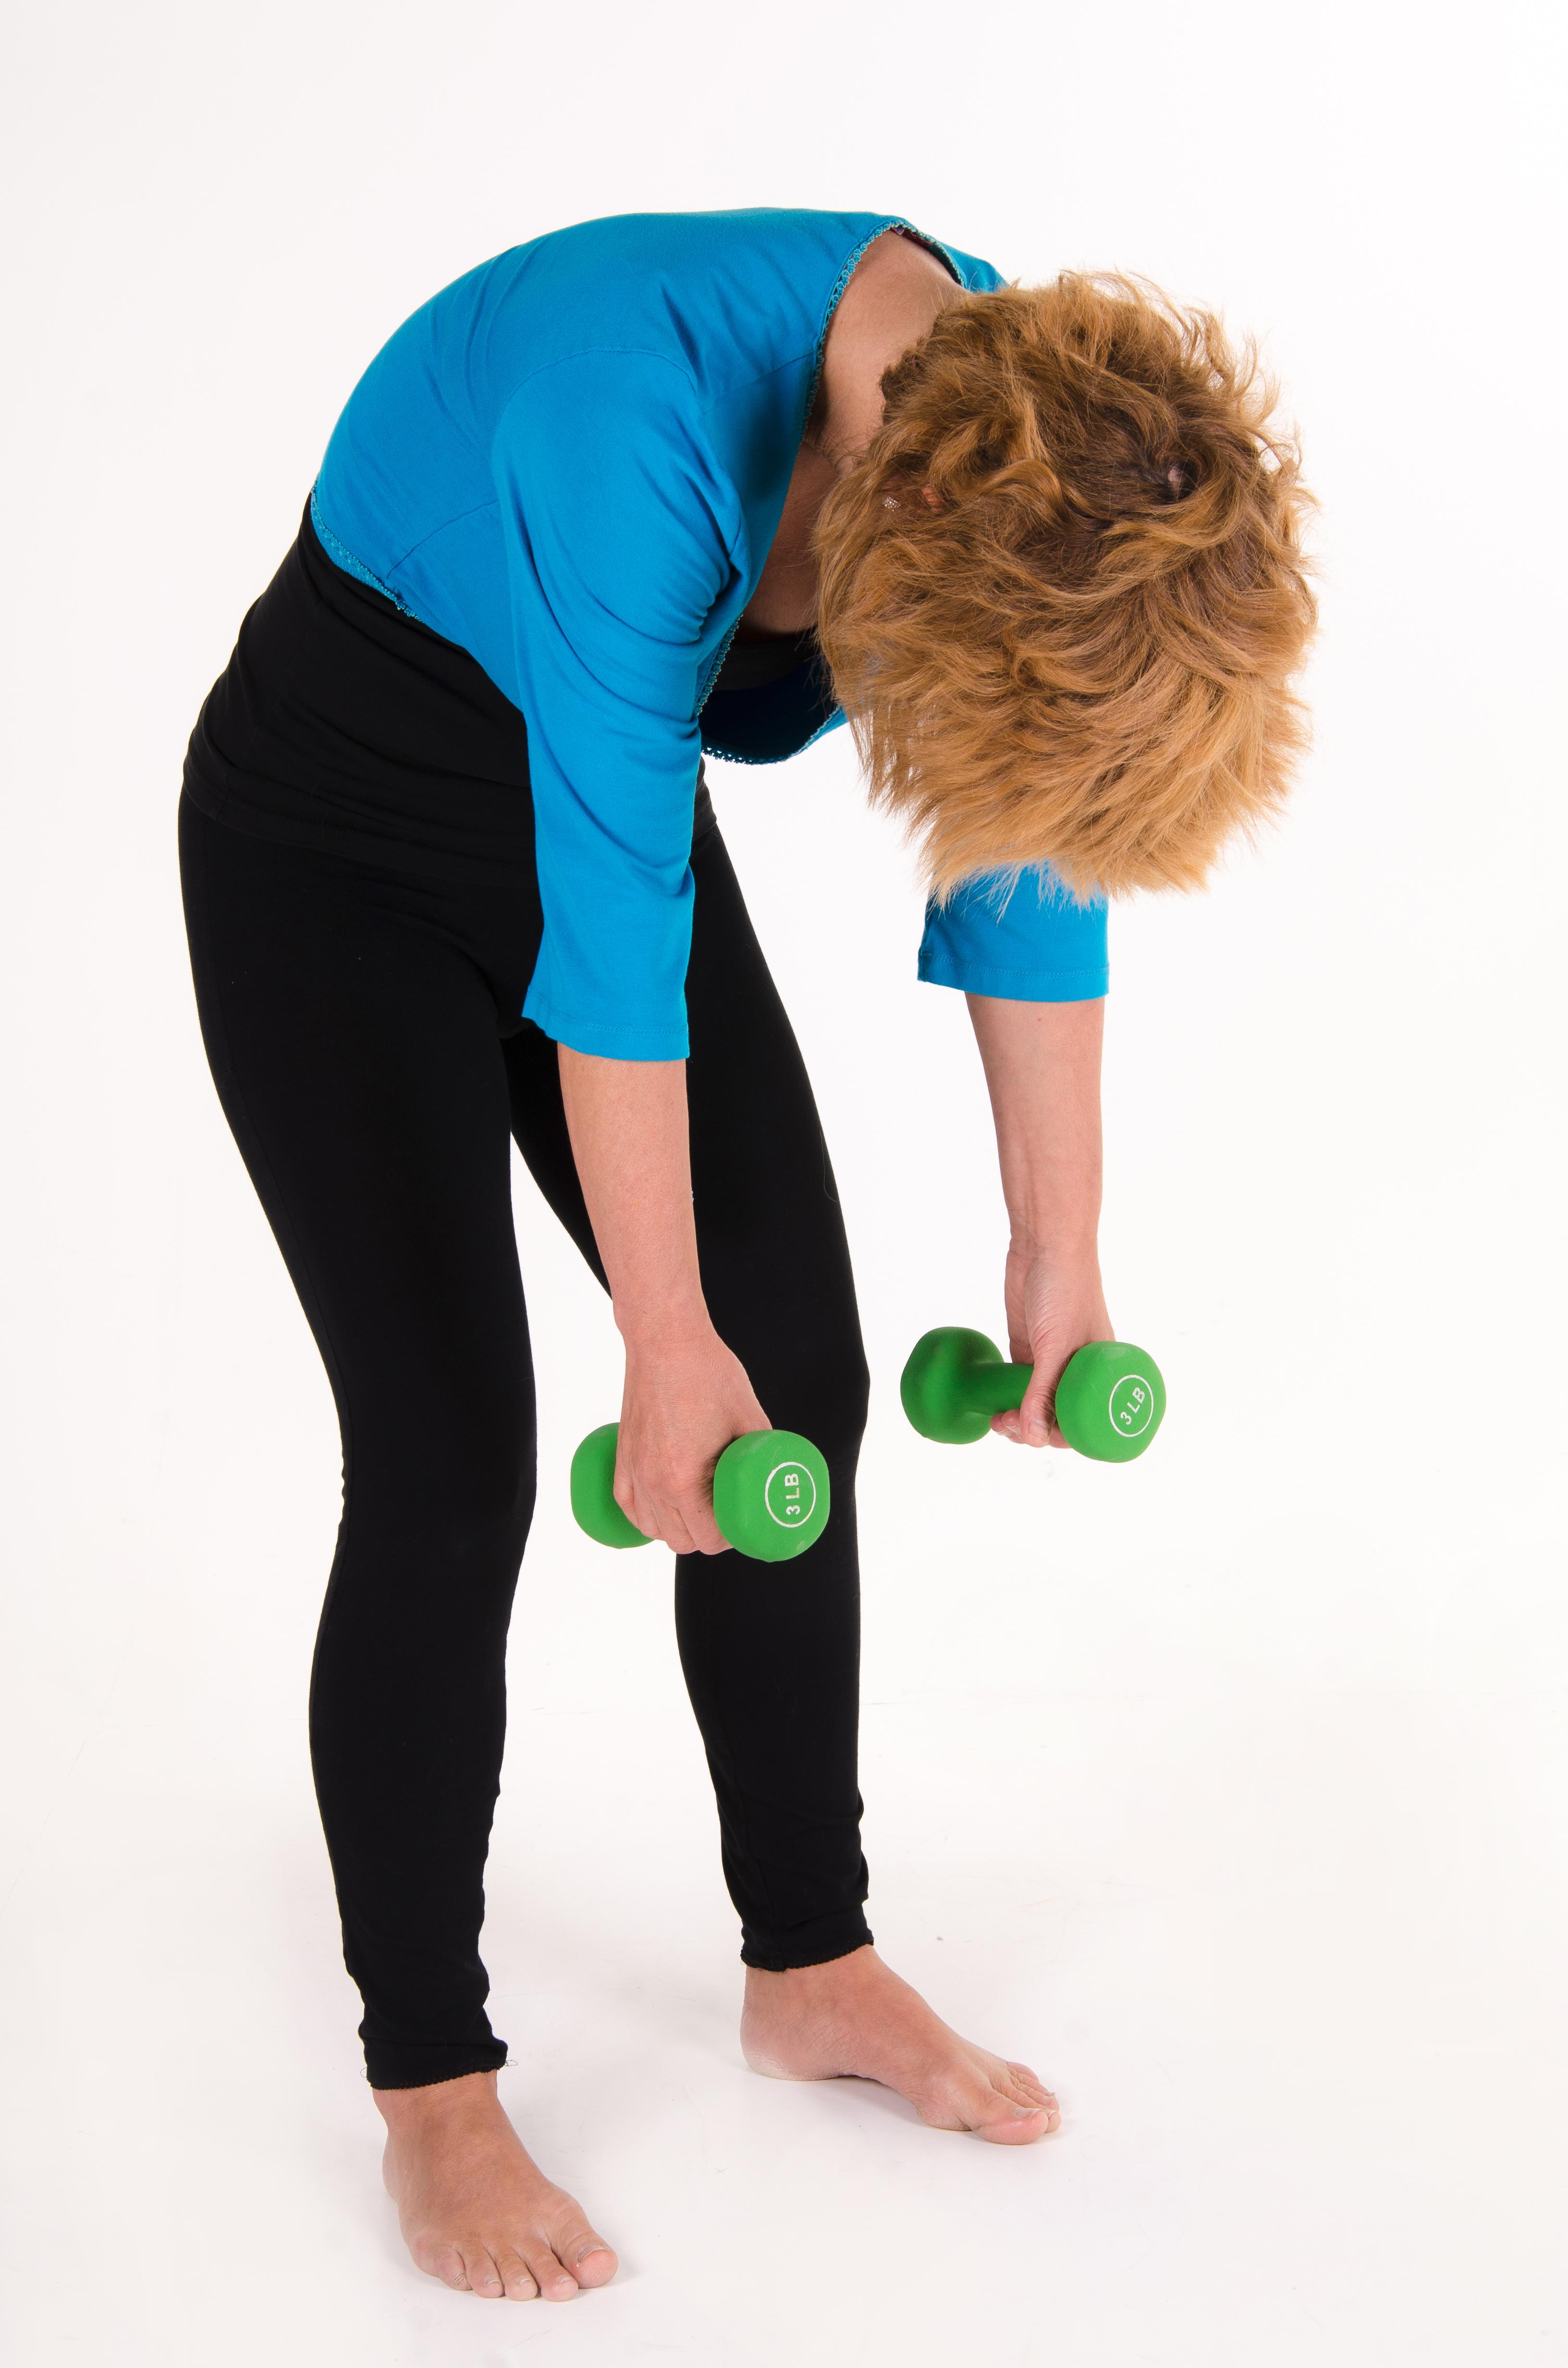 Stretching-7989